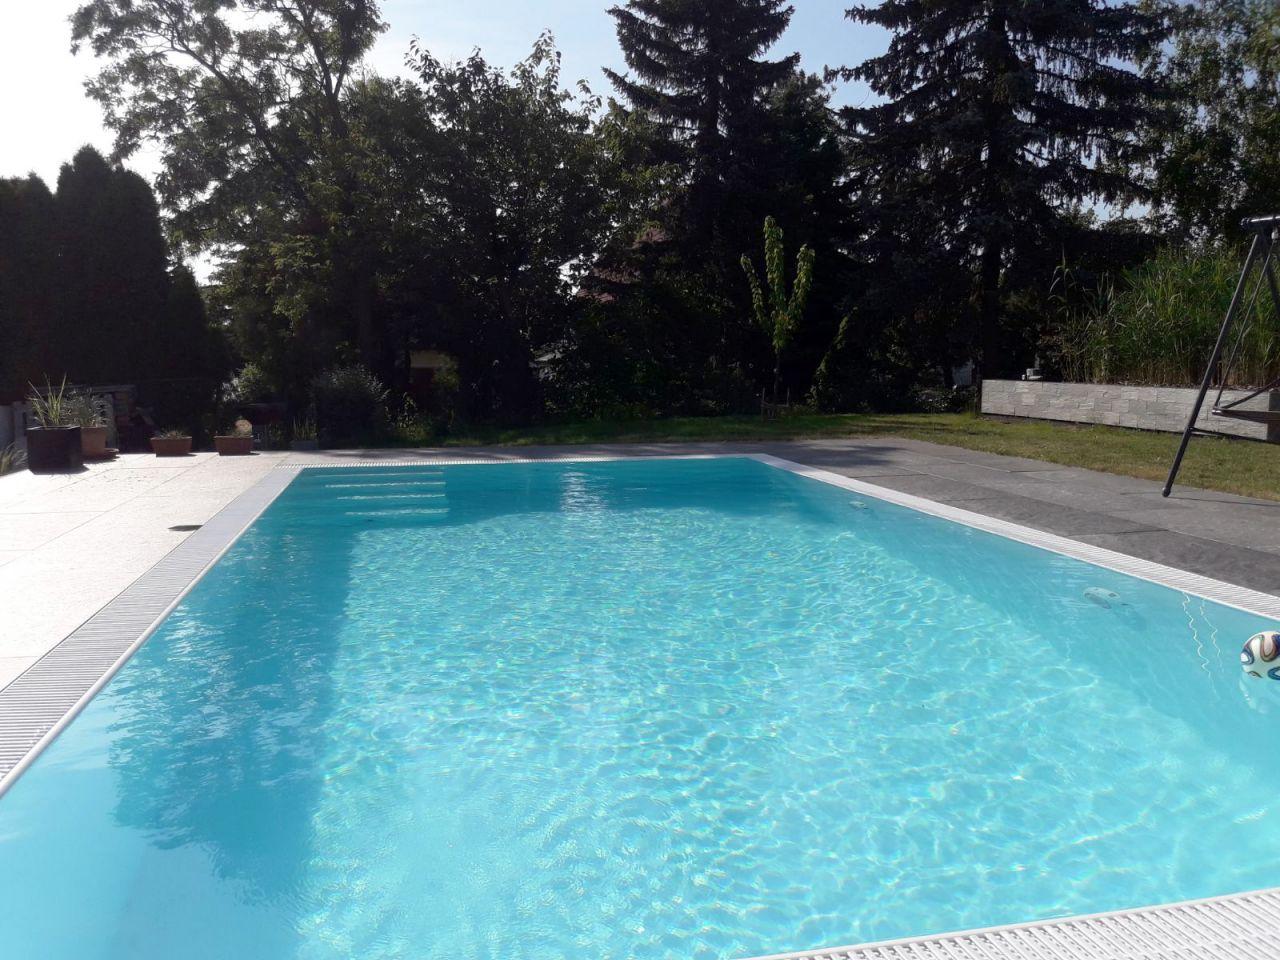 Albixon G2 Polypropylen Pool 3,5x7x1,50m weiß mit Ecktreppe